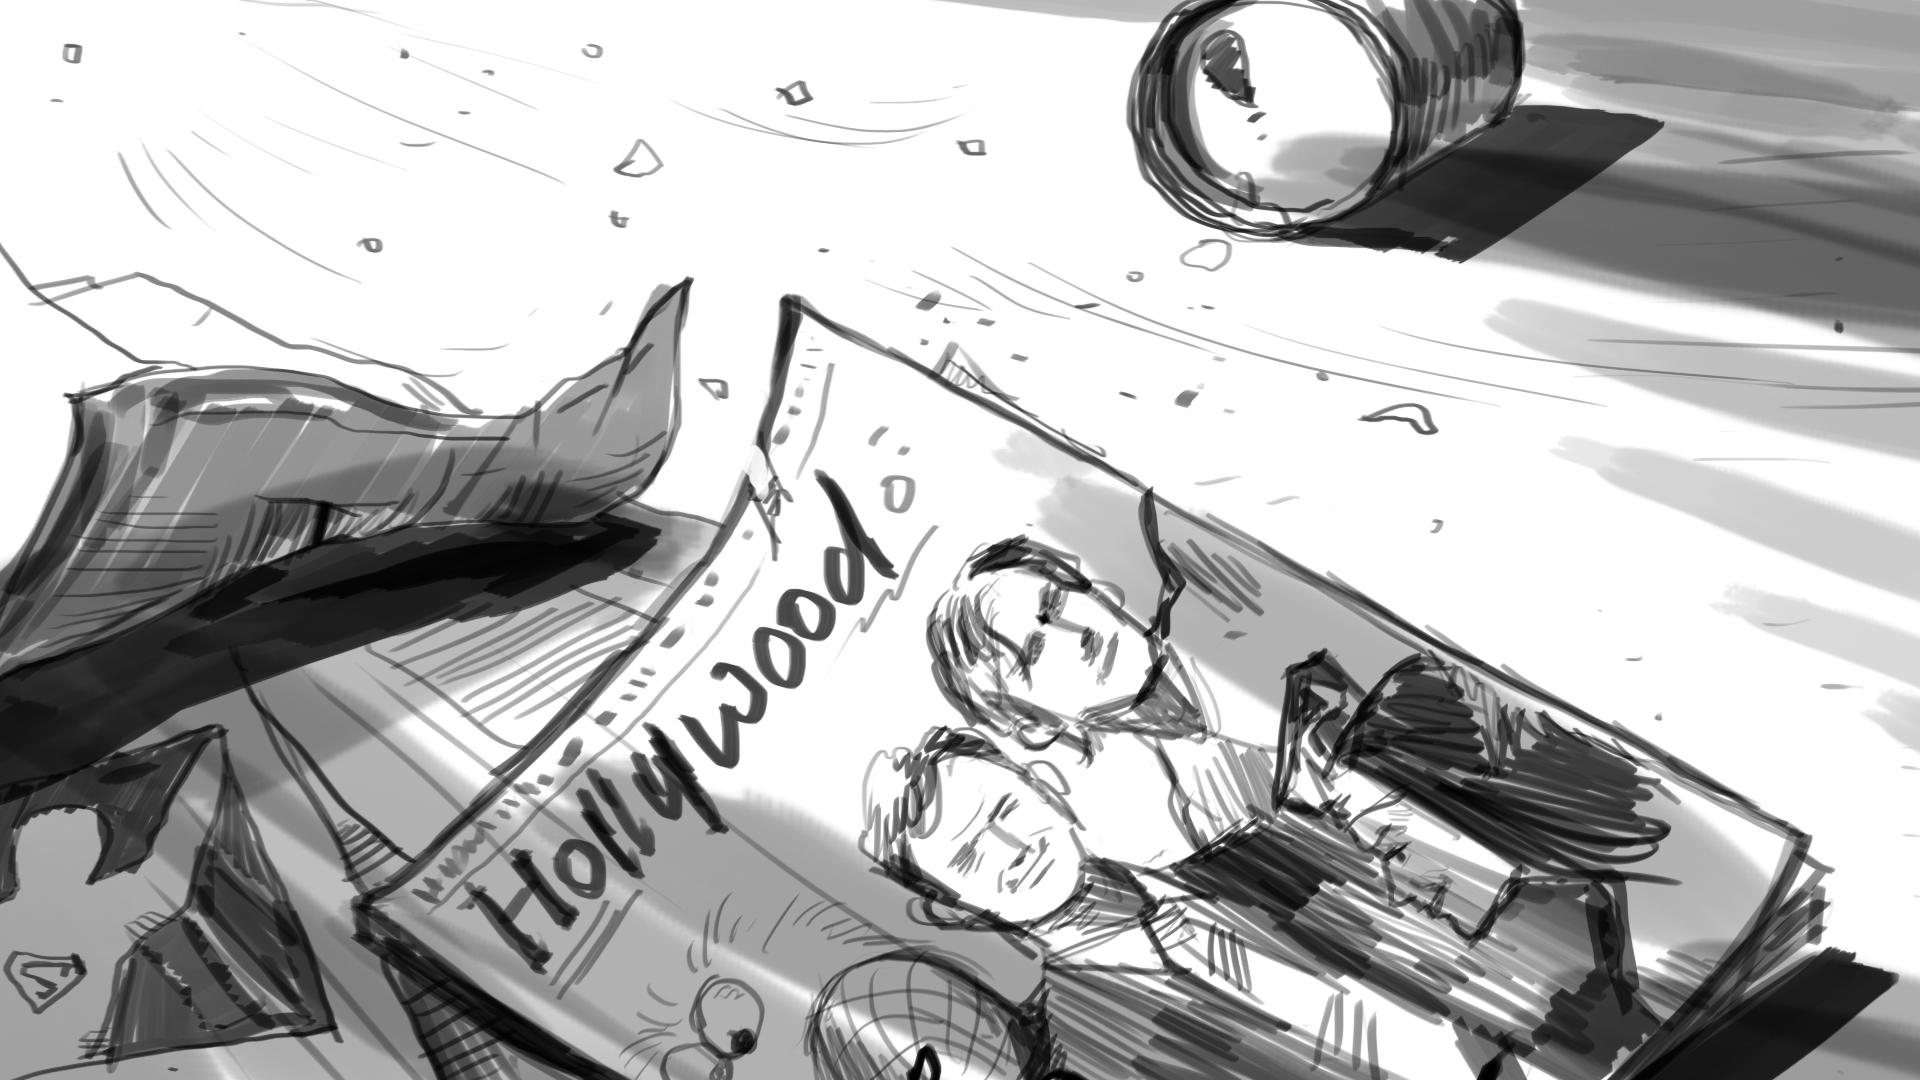 The Kid_Illustration3